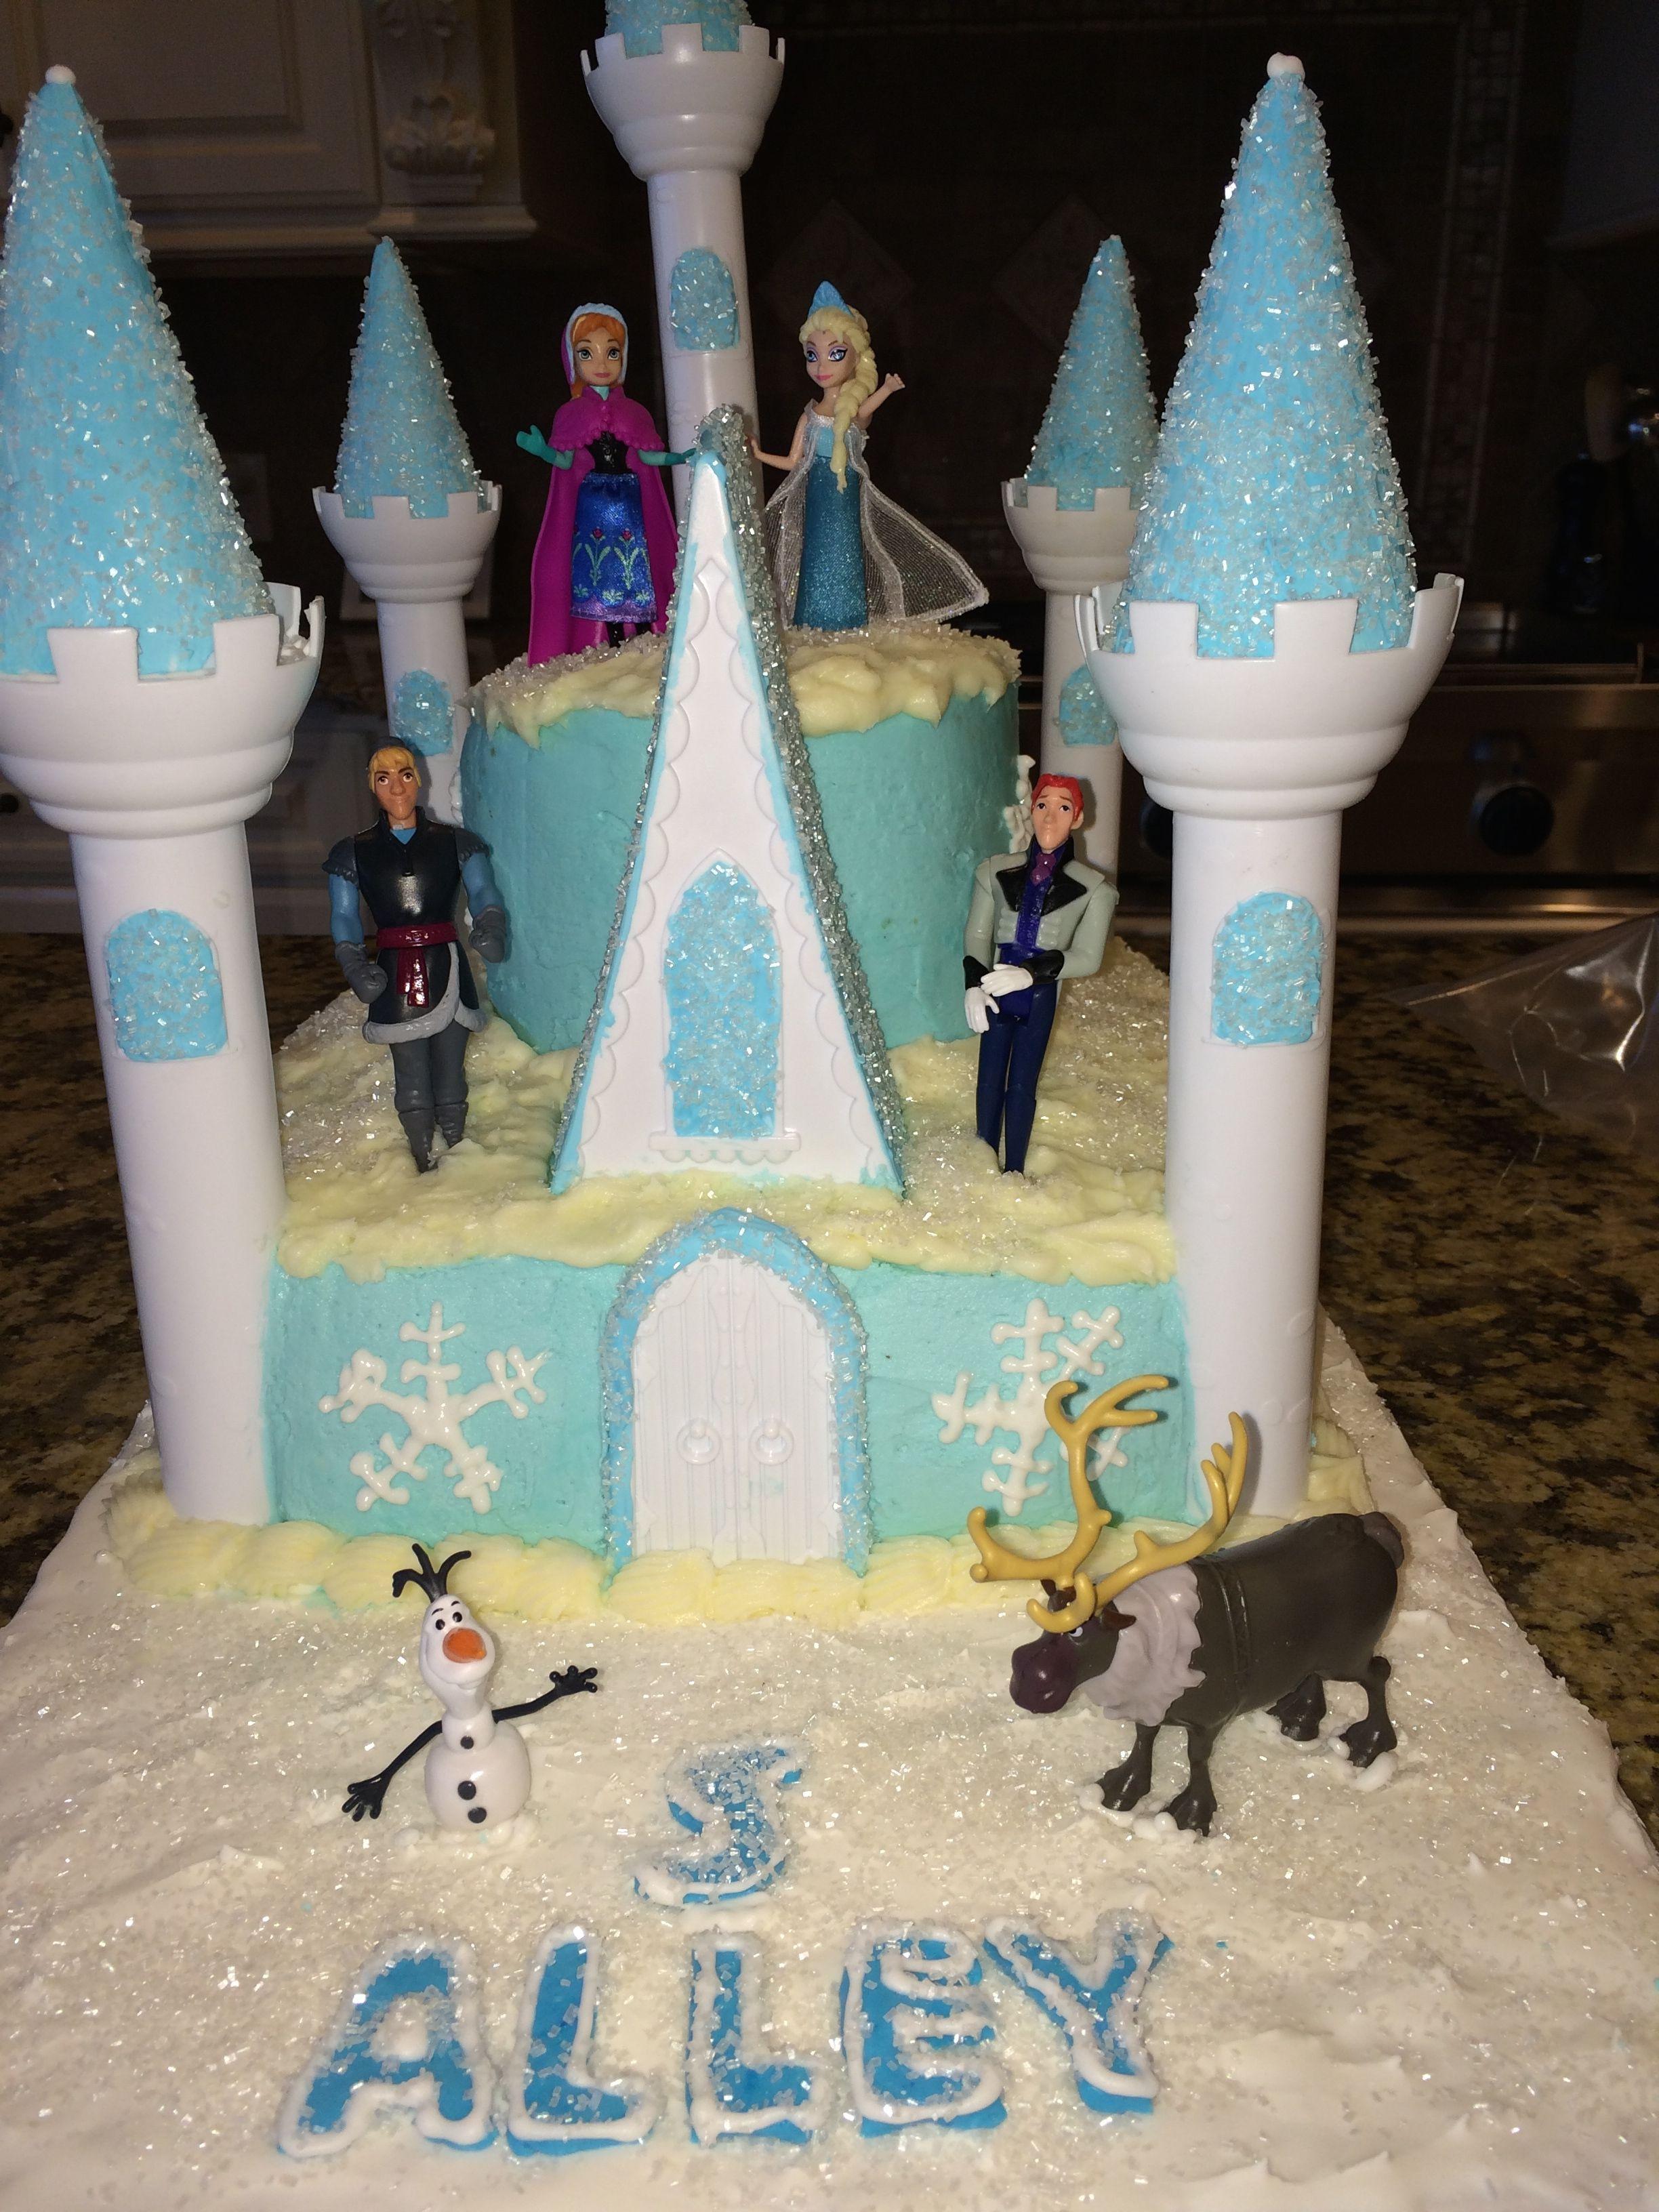 Frozen Ice Castle Birthday Cake I used the Wilton Romantic Castle